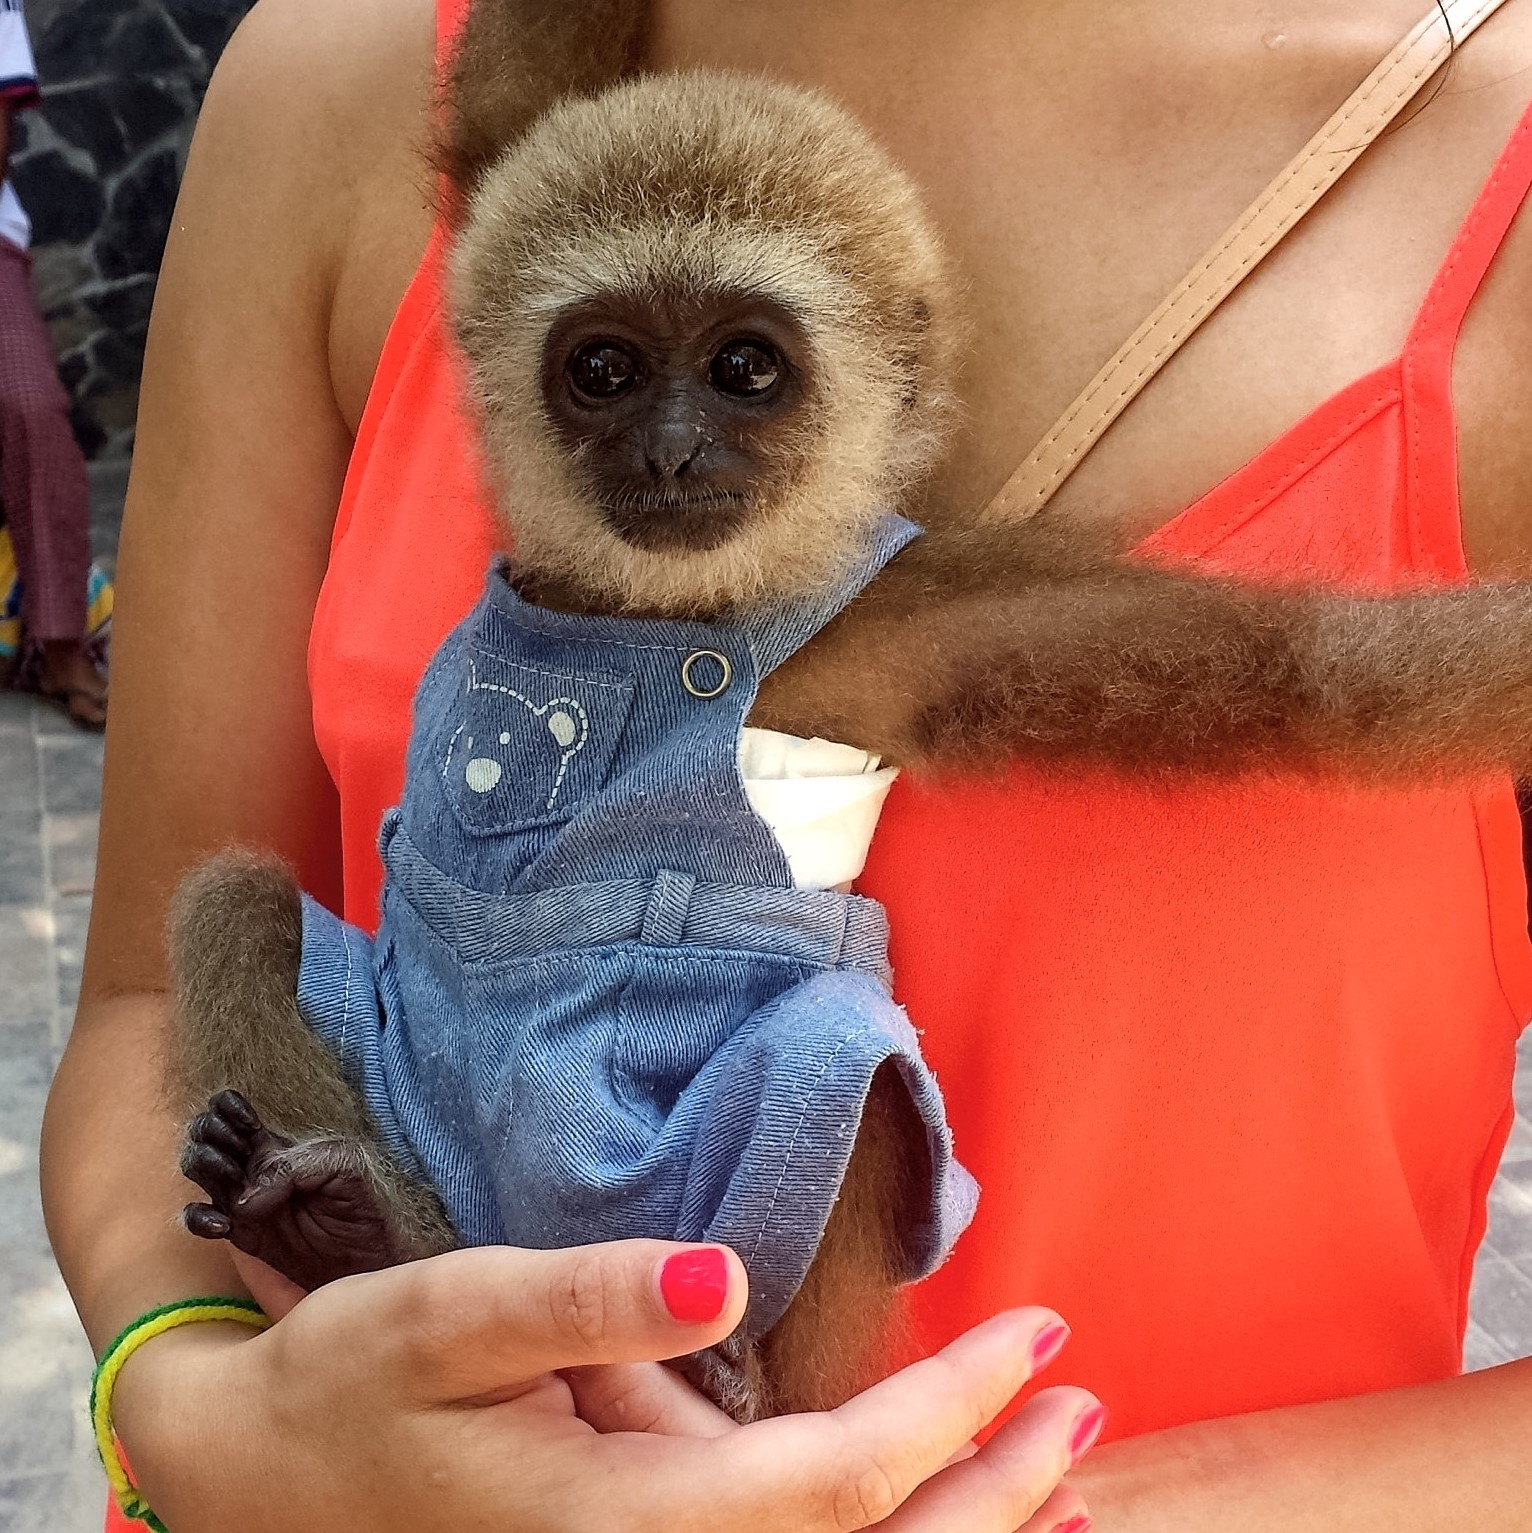 monkey on phi phi island thailand